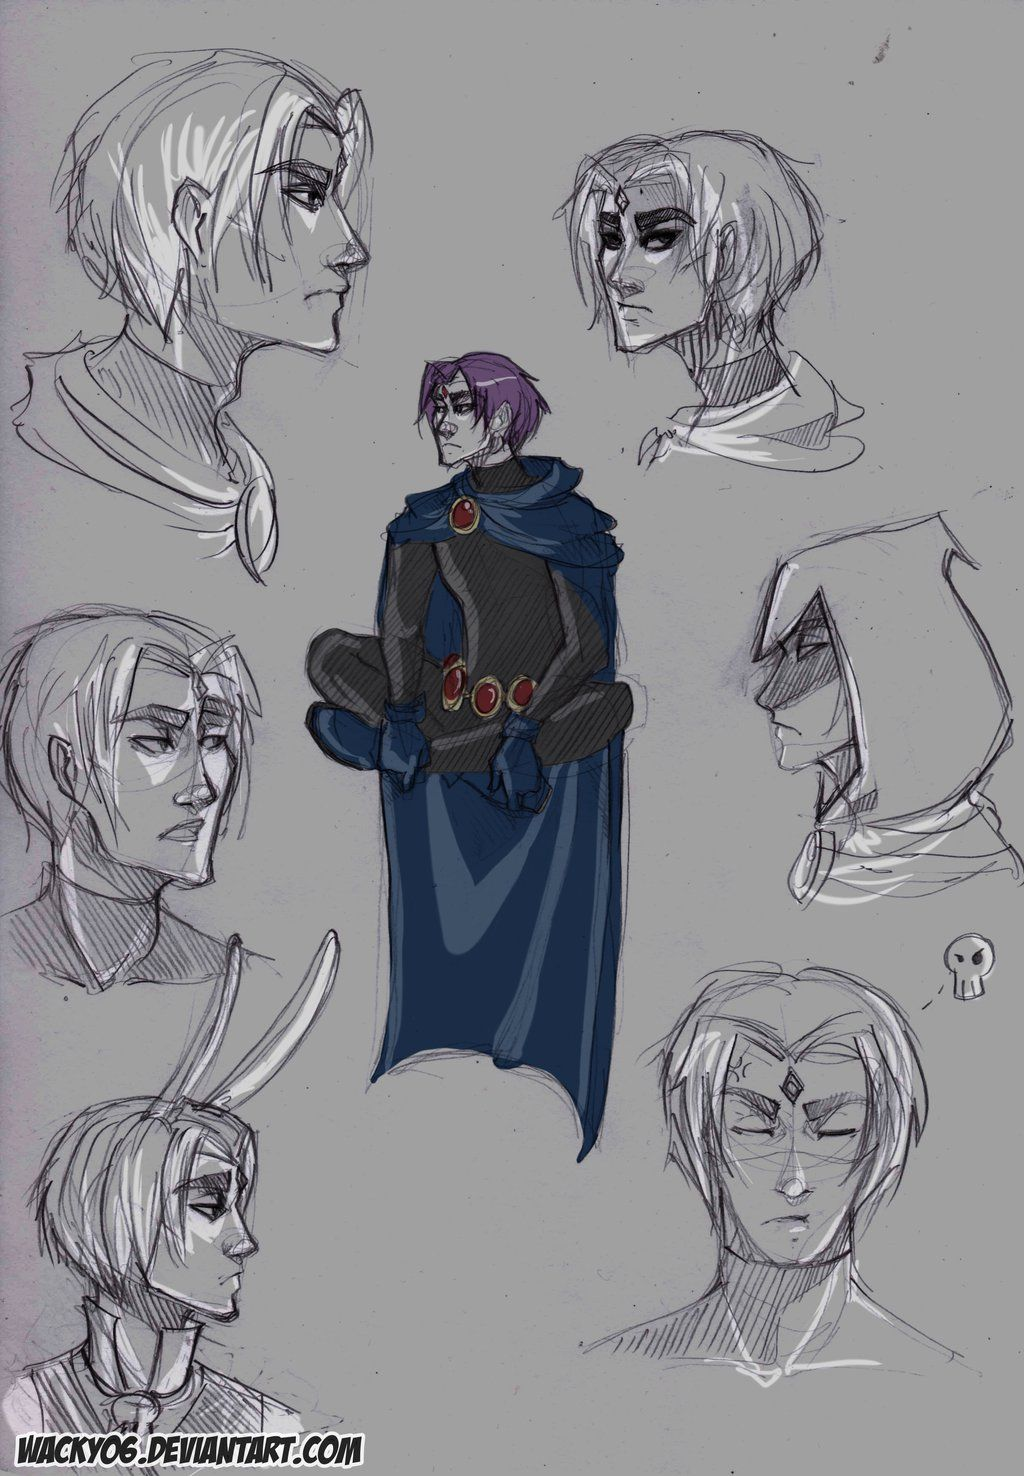 Pin By Kbmzane On Smexy Teen Titans Raven-8894